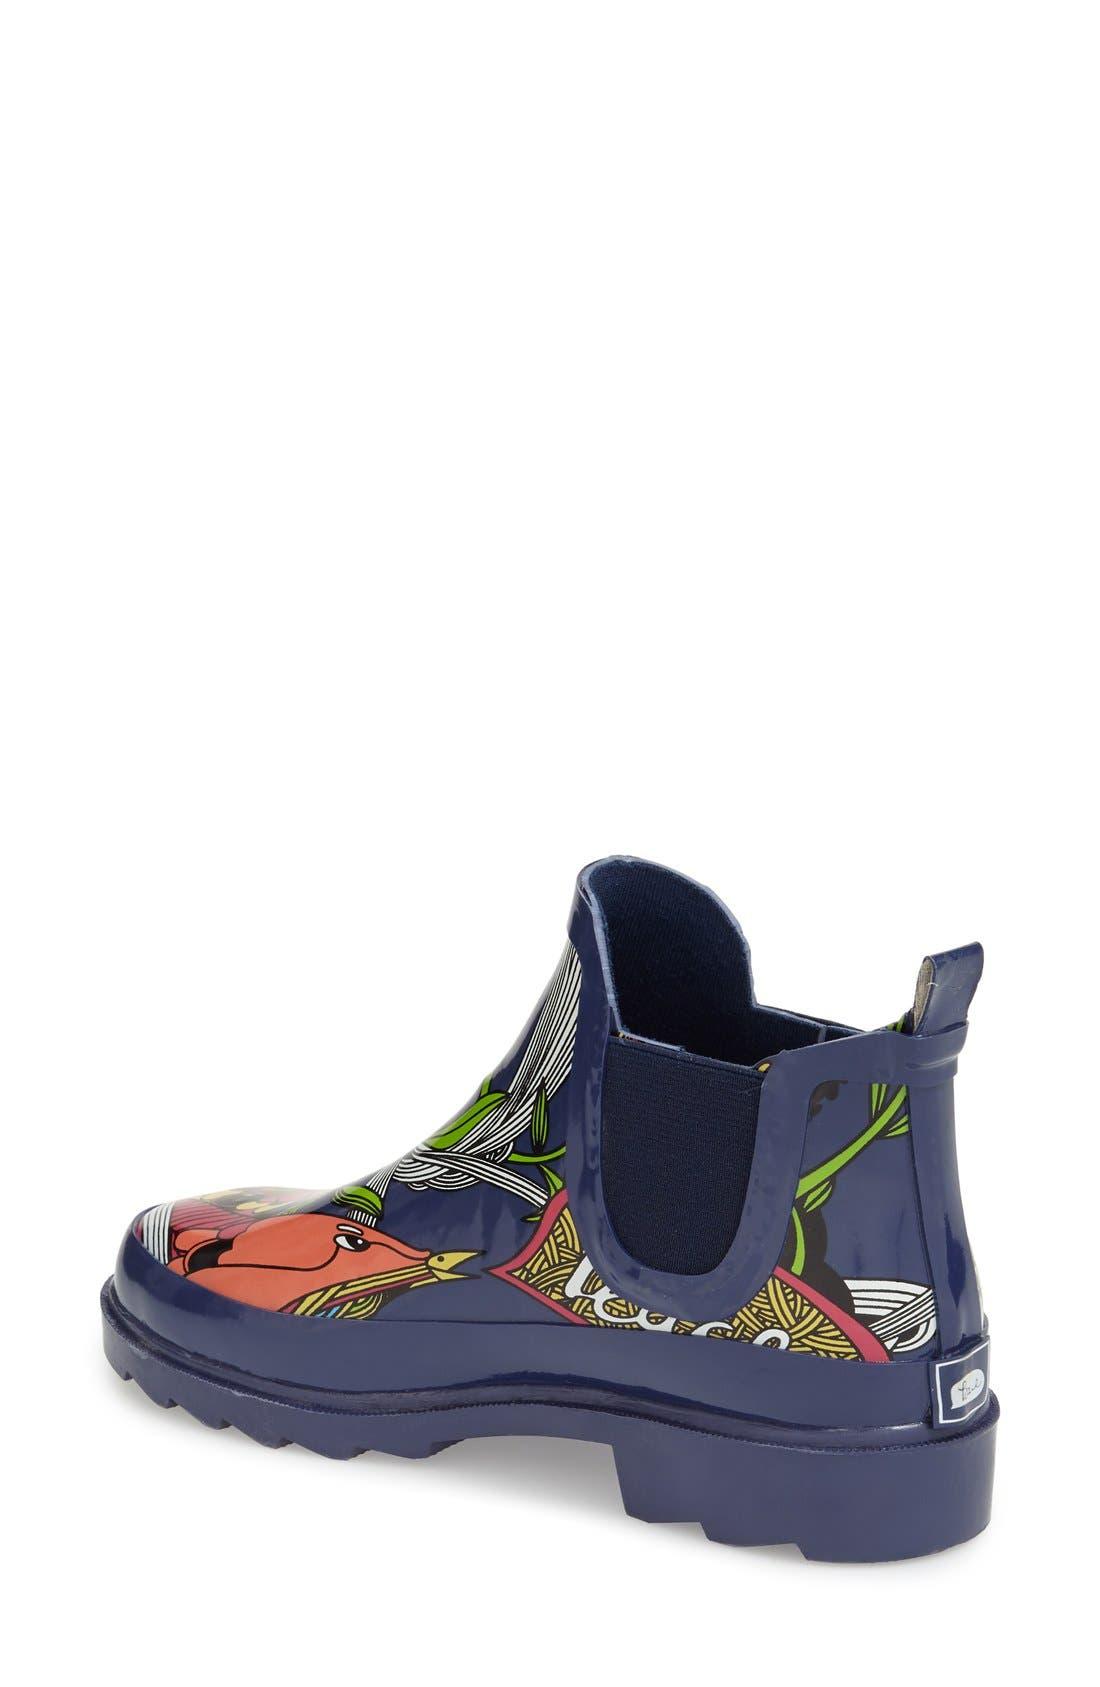 'Rhyme' Waterproof Rain Boot,                             Alternate thumbnail 37, color,